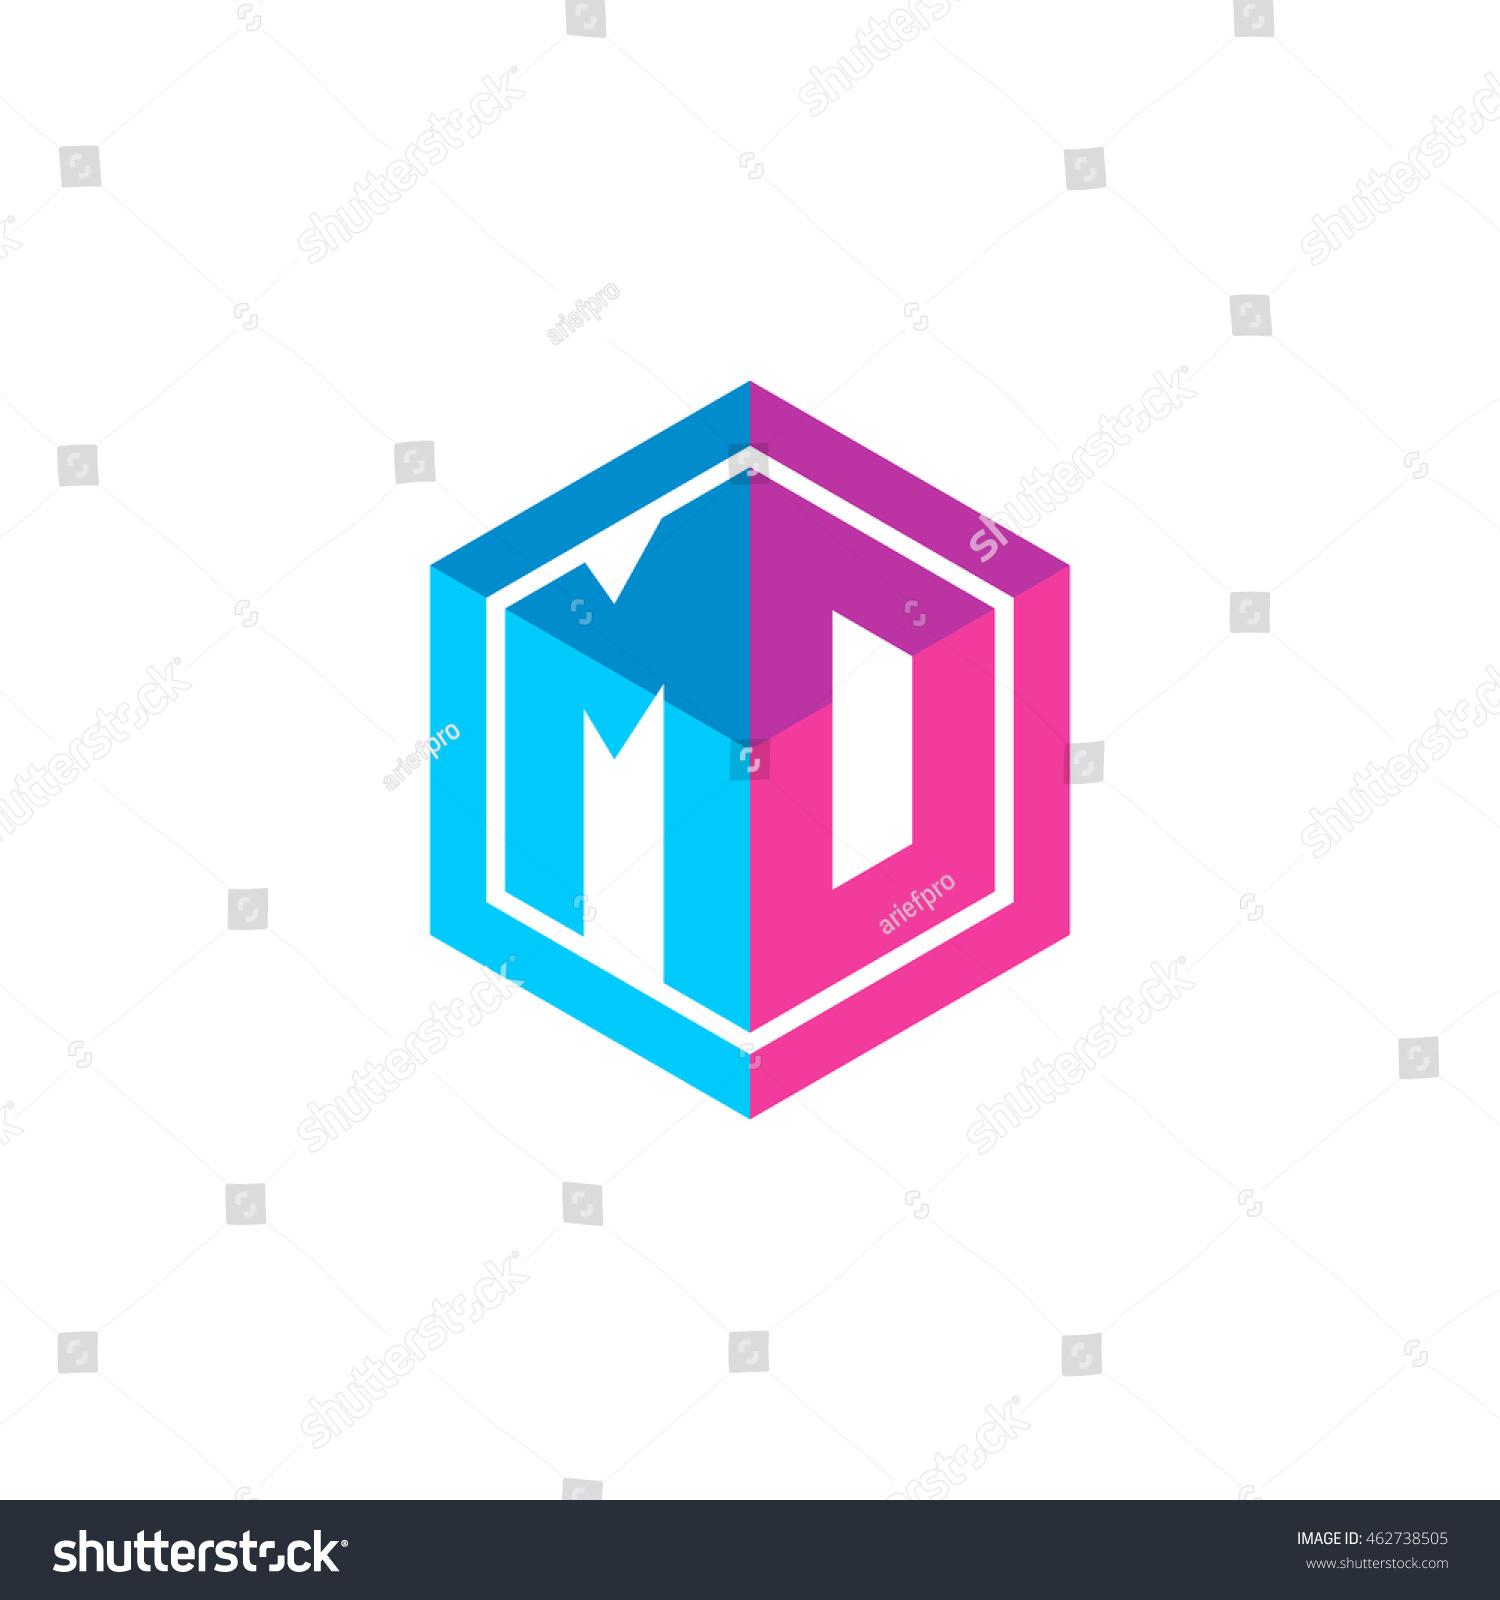 Tj initial luxury ornament monogram logo stock vector - Initial Letters Md Mo Hexagon Box Shape Logo Blue Pink Purple